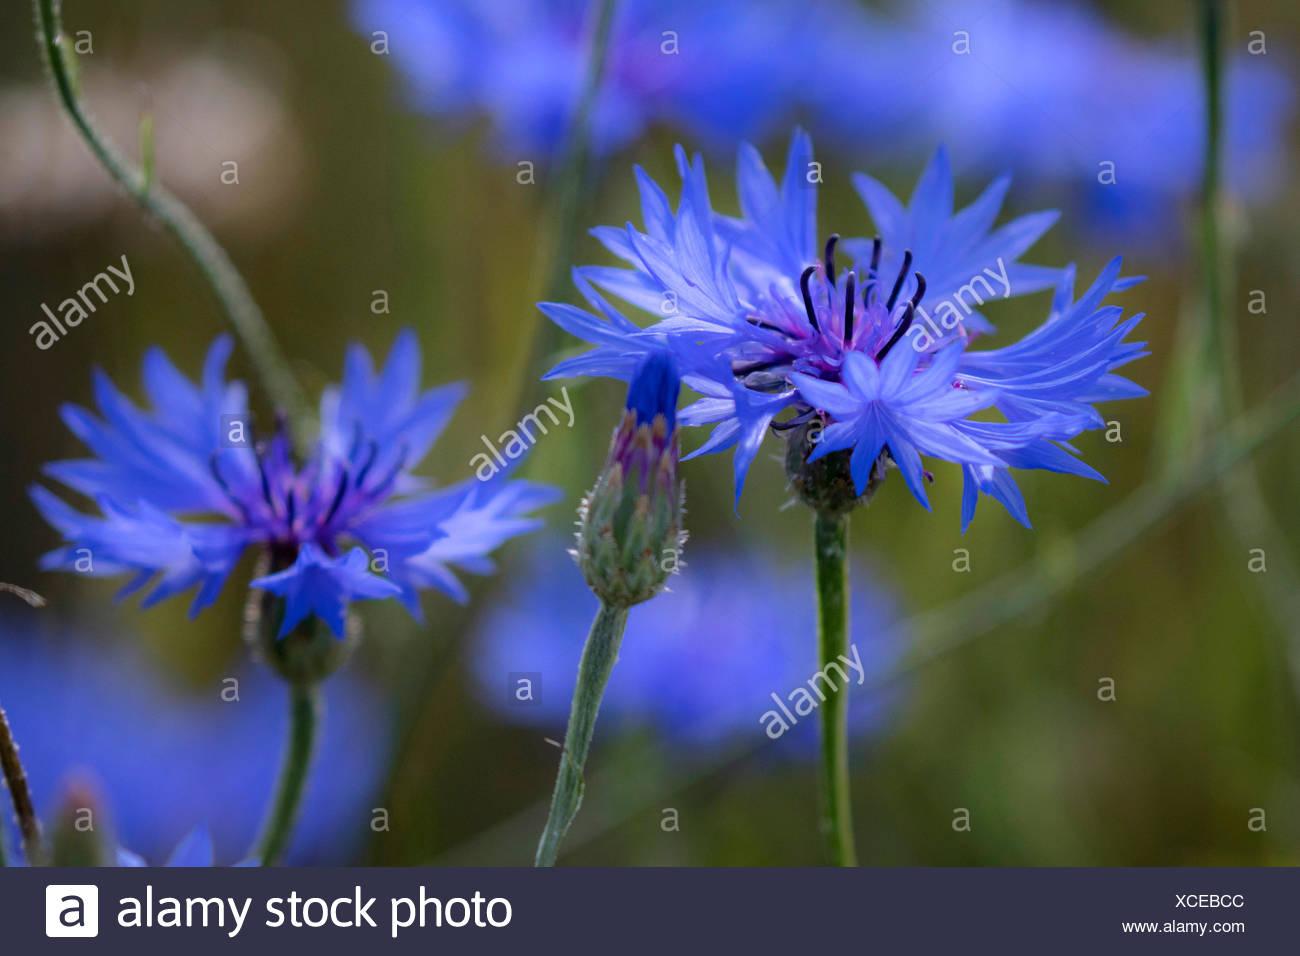 Kornblume (Centaurea cyanus), blaue Blueten, Deutschland, Bayern   bachelor's button, bluebottle, cornflower (Centaurea cyanus), - Stock Image